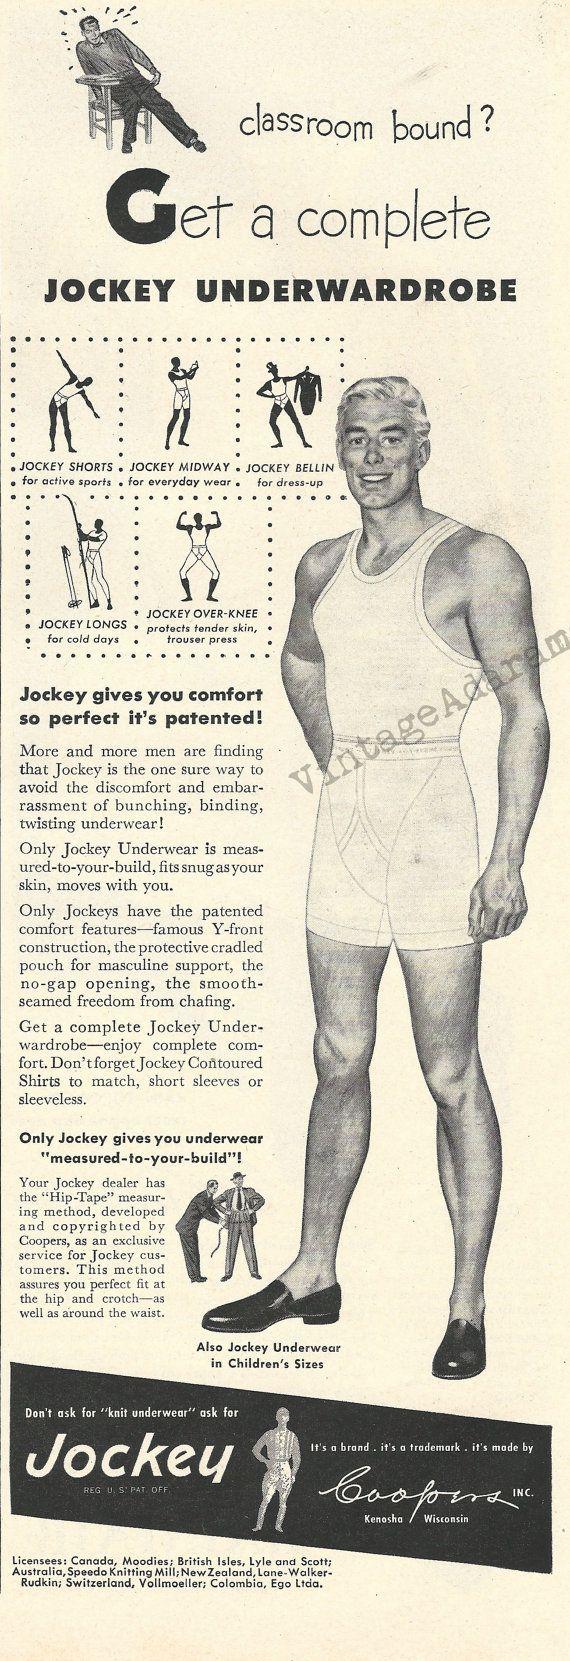 Jockey Men's Underwear Original 1948 Vintage Ad w/ Black & White Illustration of Man in Sleeveless Undershirt, Y-Front Briefs (and Shoes!)